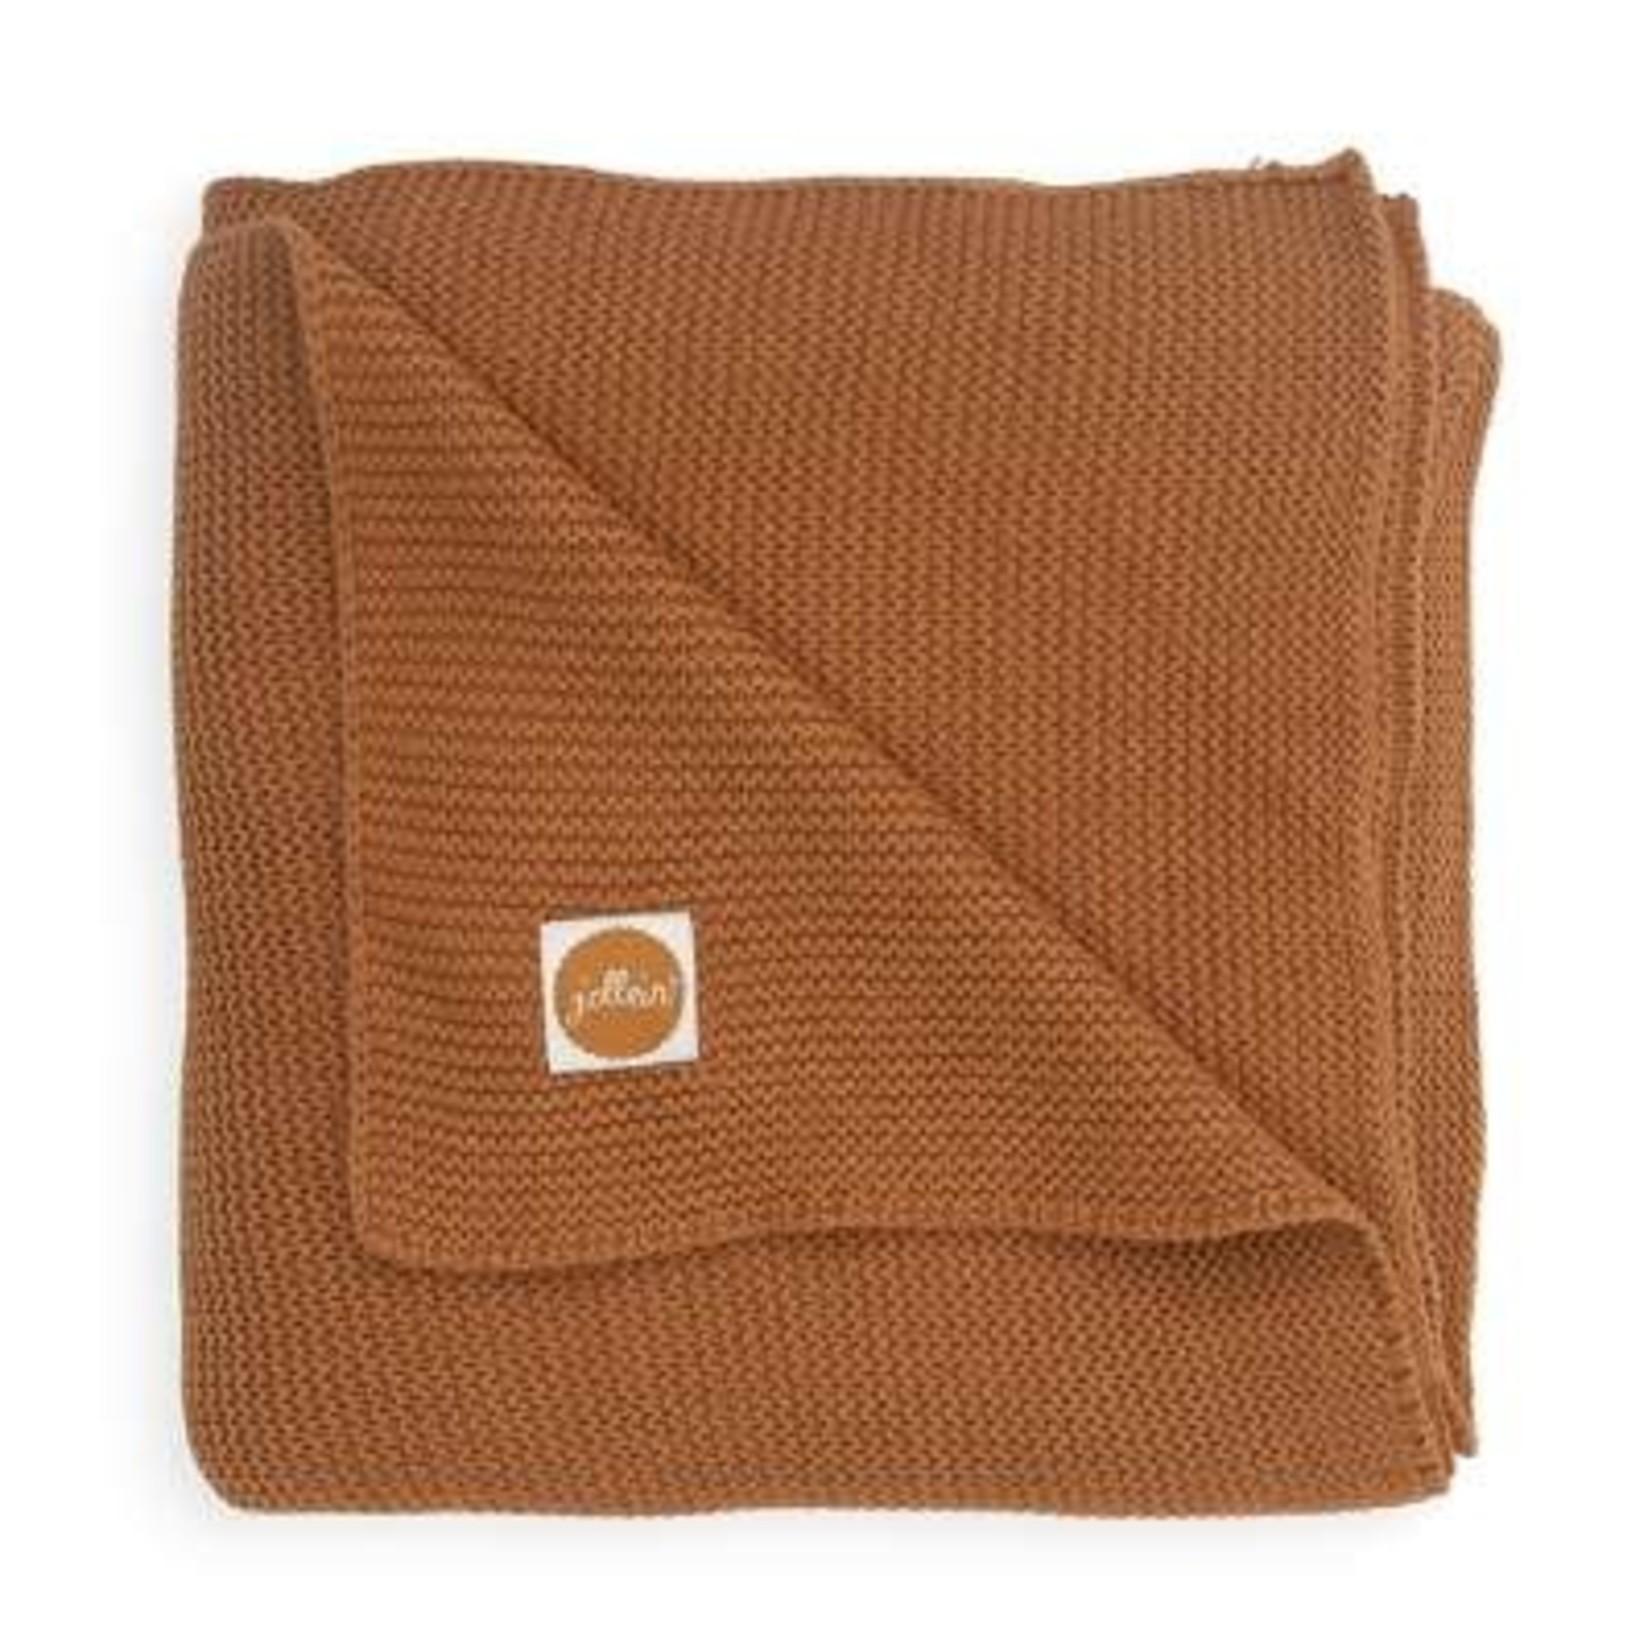 Jollein Jollein Deken 75x100cm Basic knit Caramel